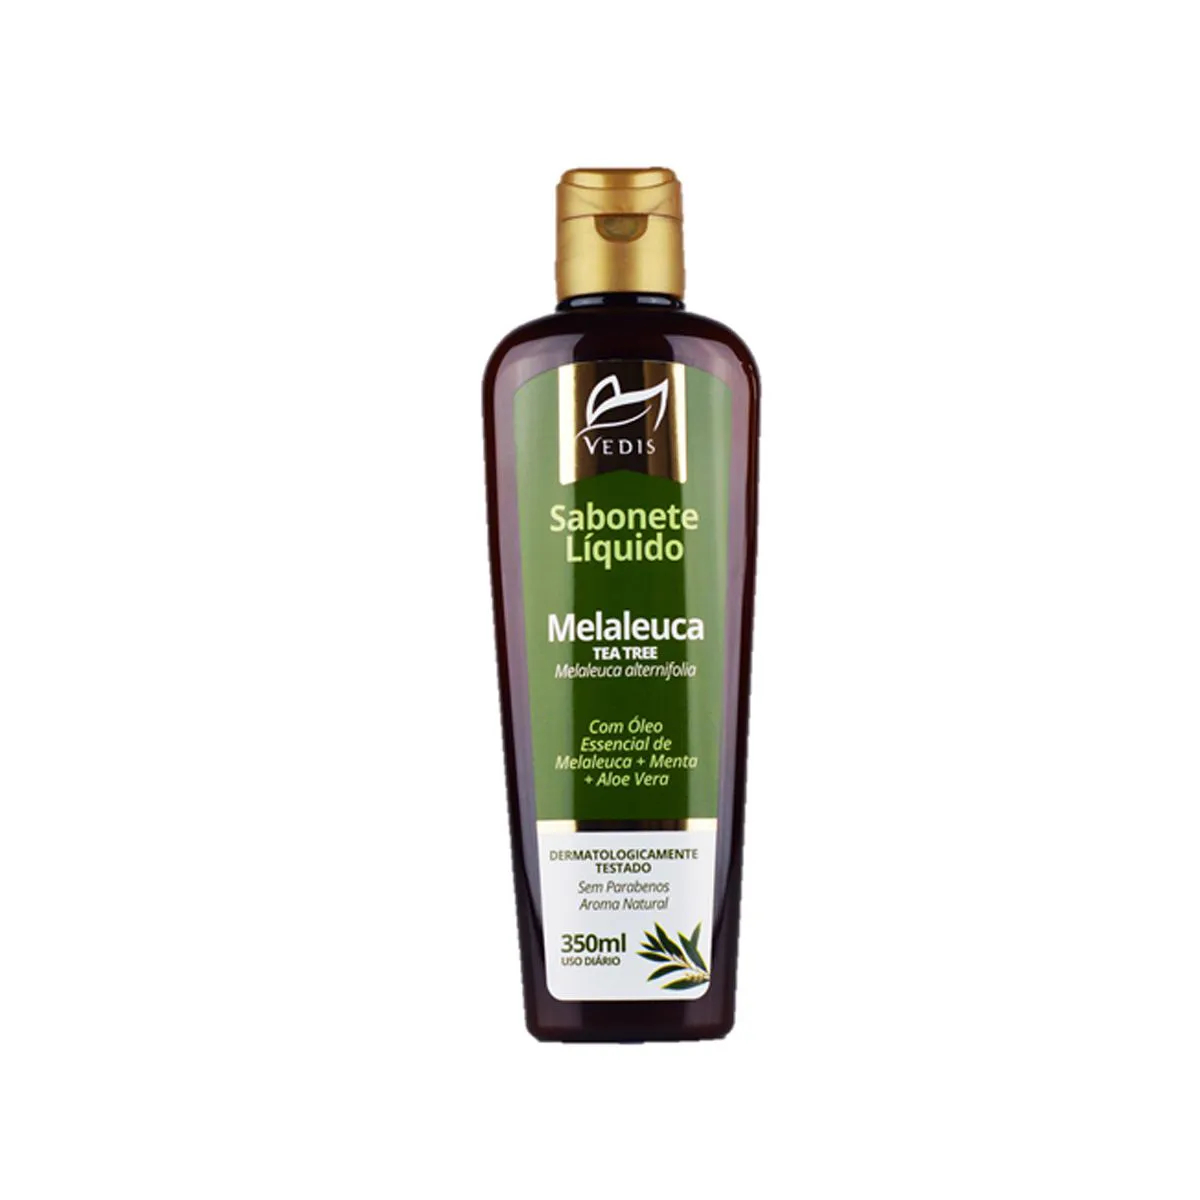 Sabonete Liquido de Melaleuca 350ml  - Vedis